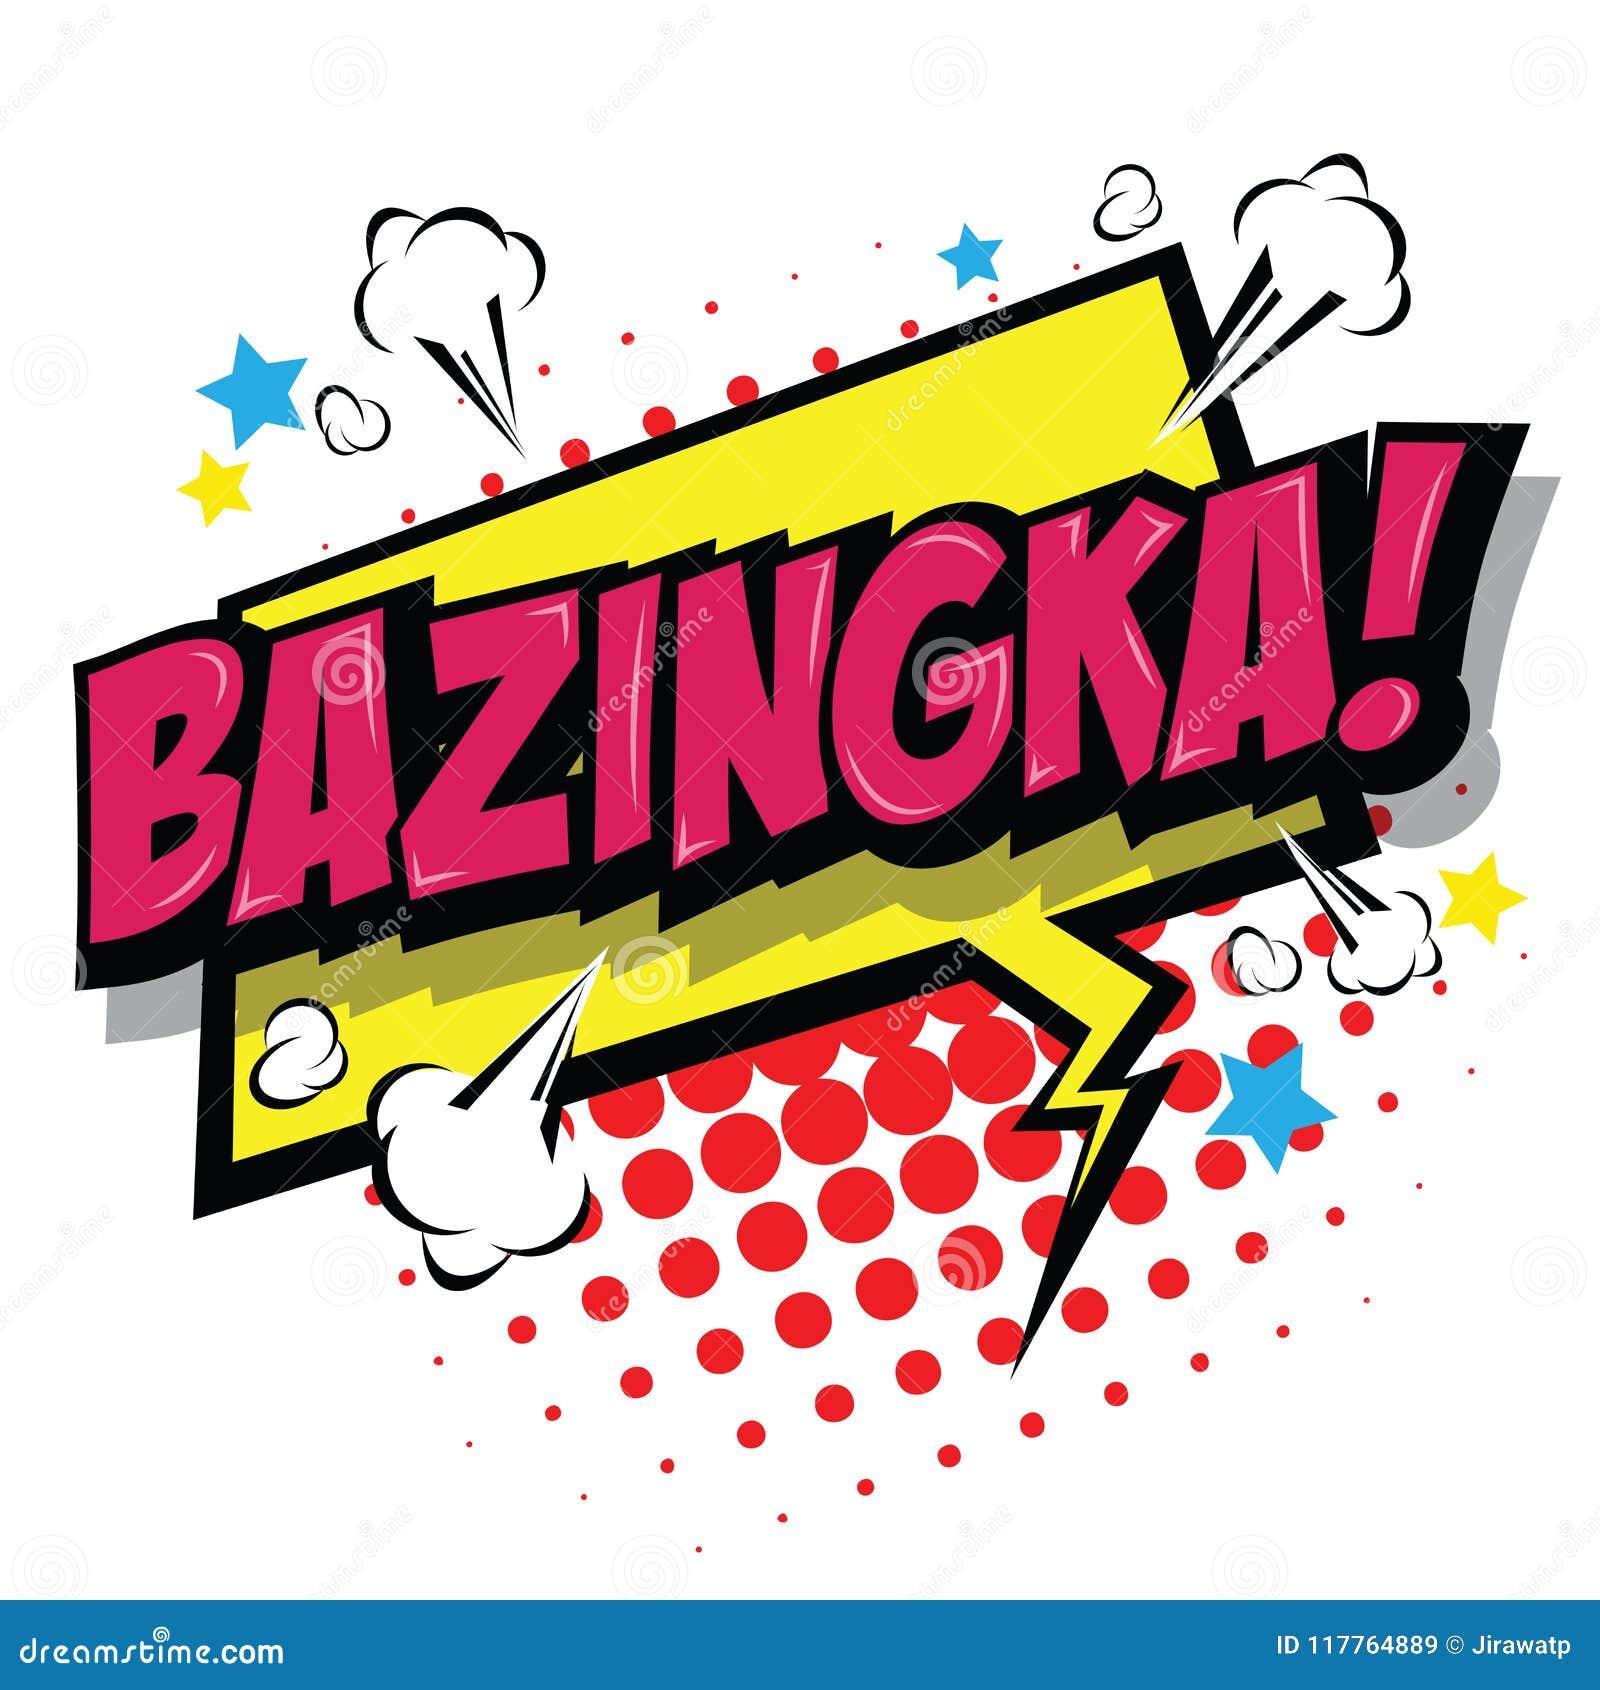 Bazinga stock vector. Illustration of icon, exclamation 36744669.